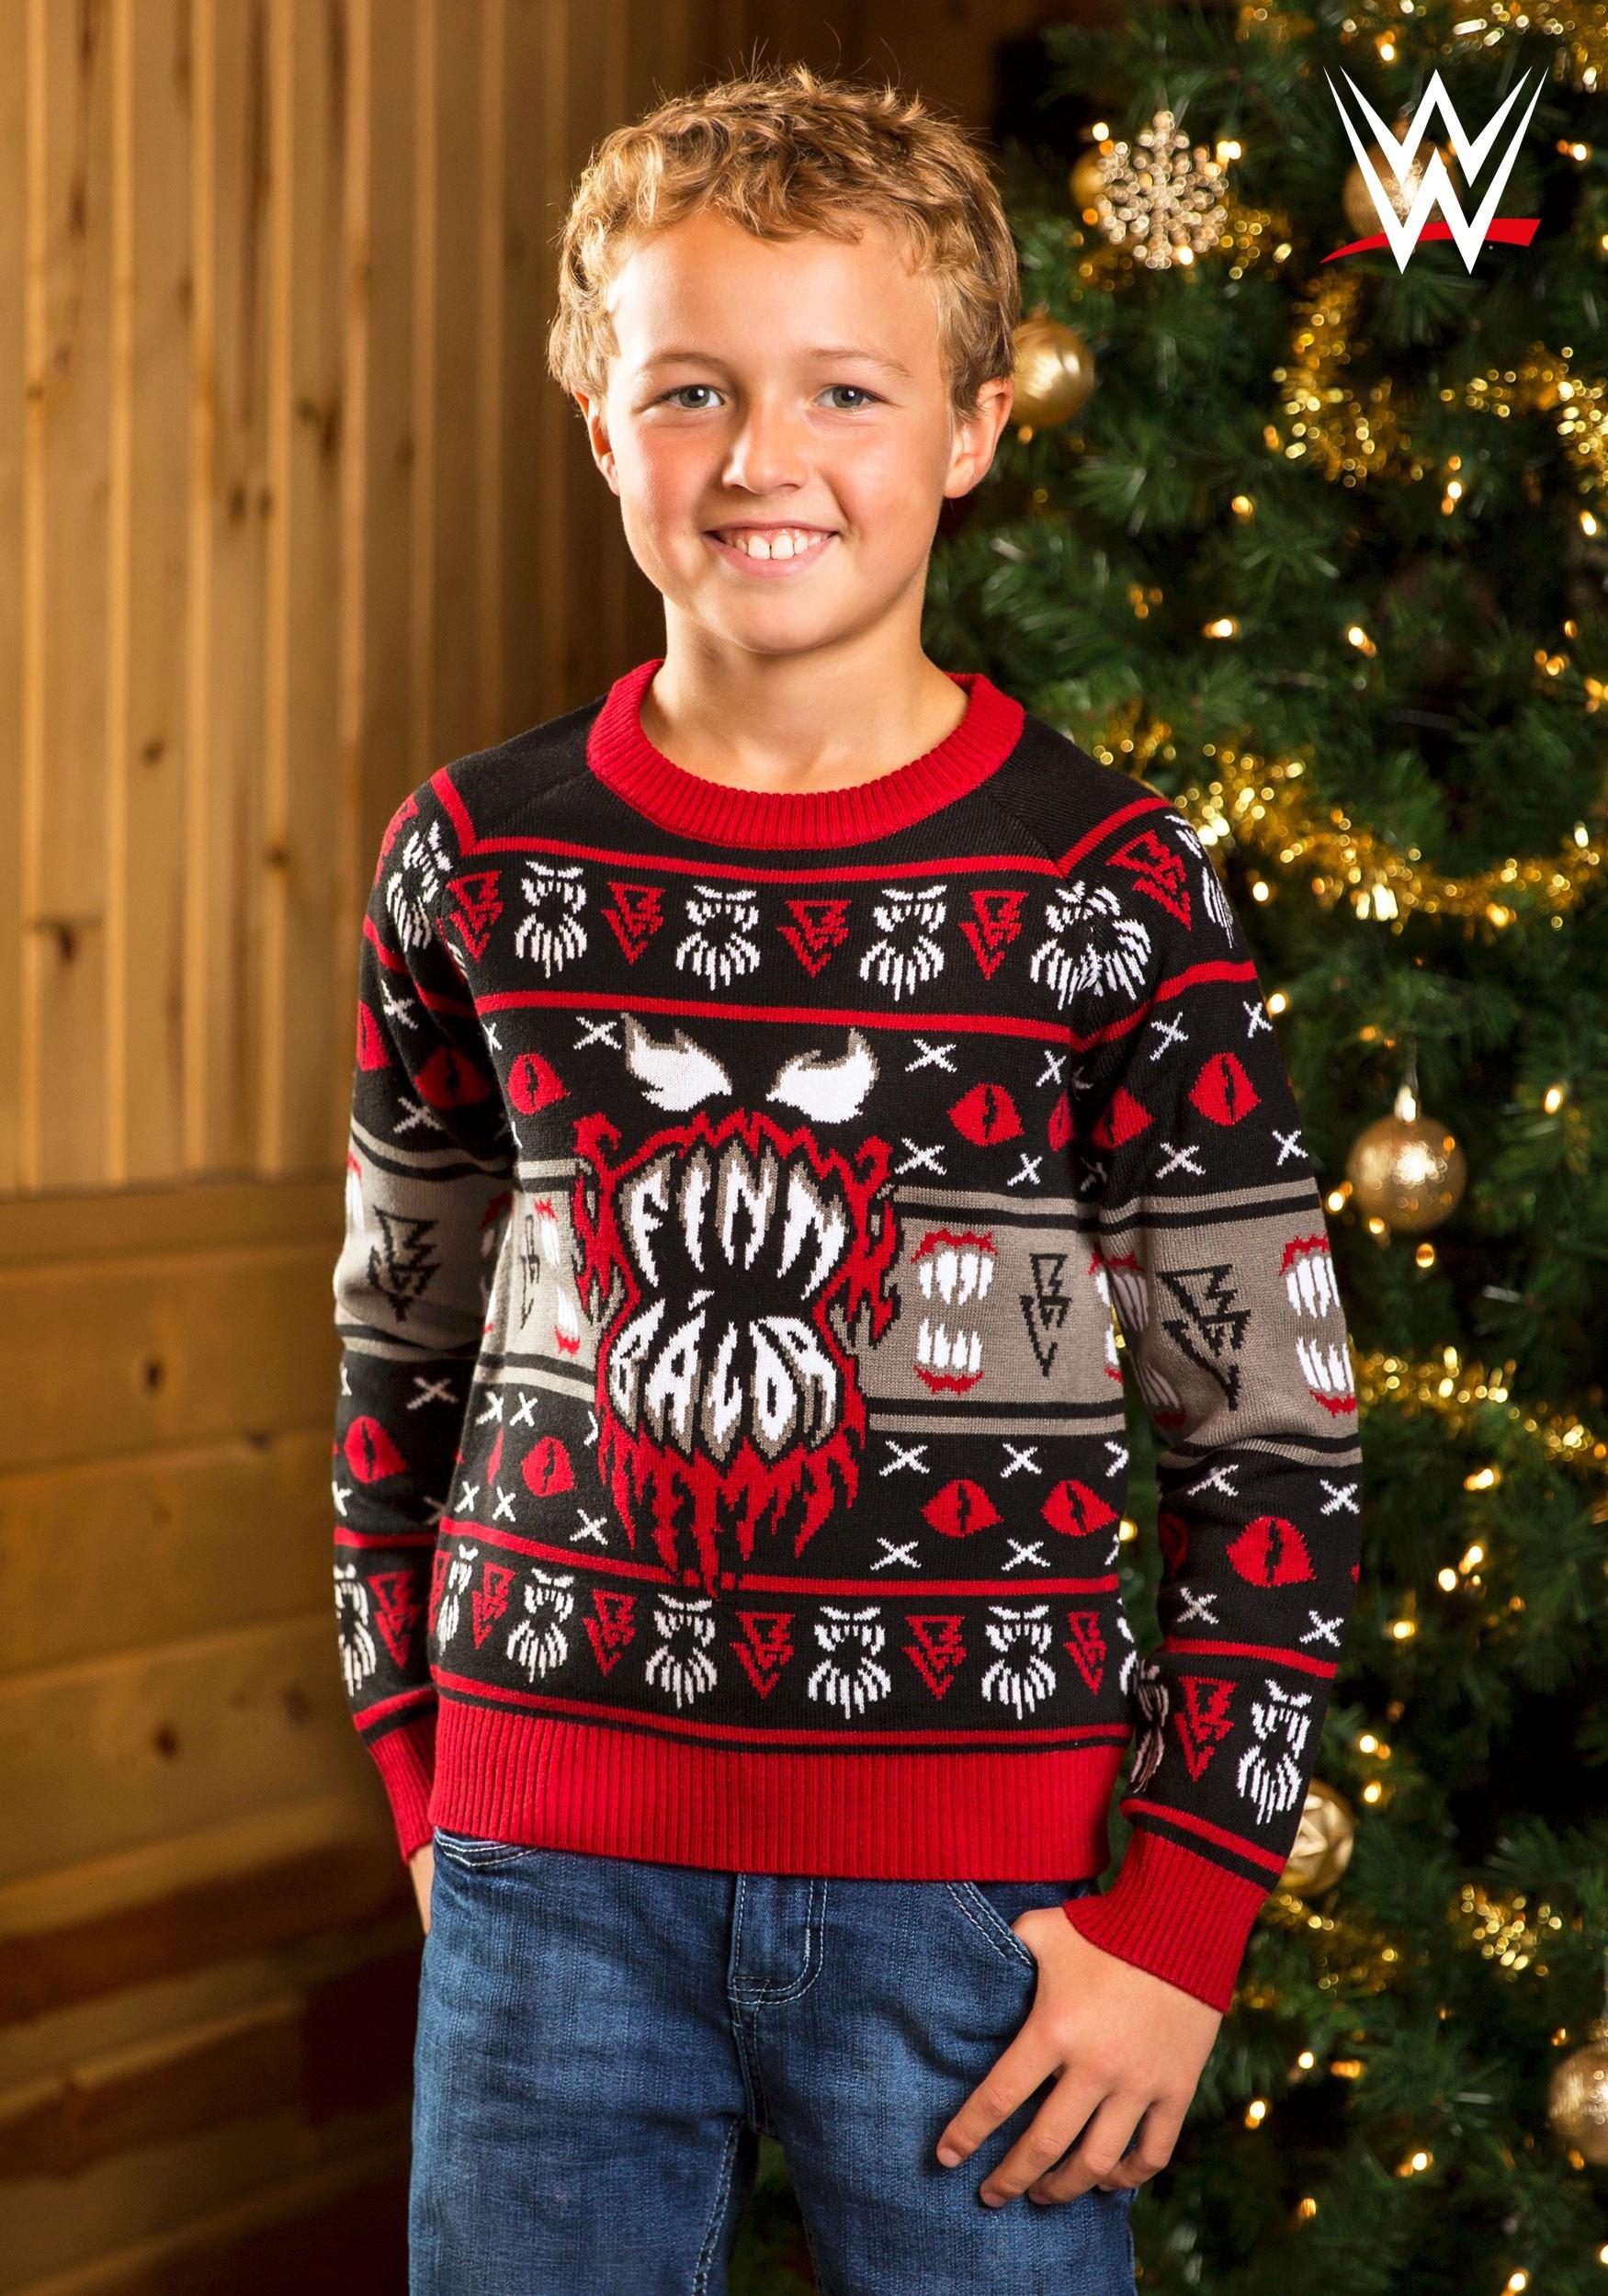 Ugly Christmas Sweater Kids.Child Wwe Finn Balor Ugly Christmas Sweater